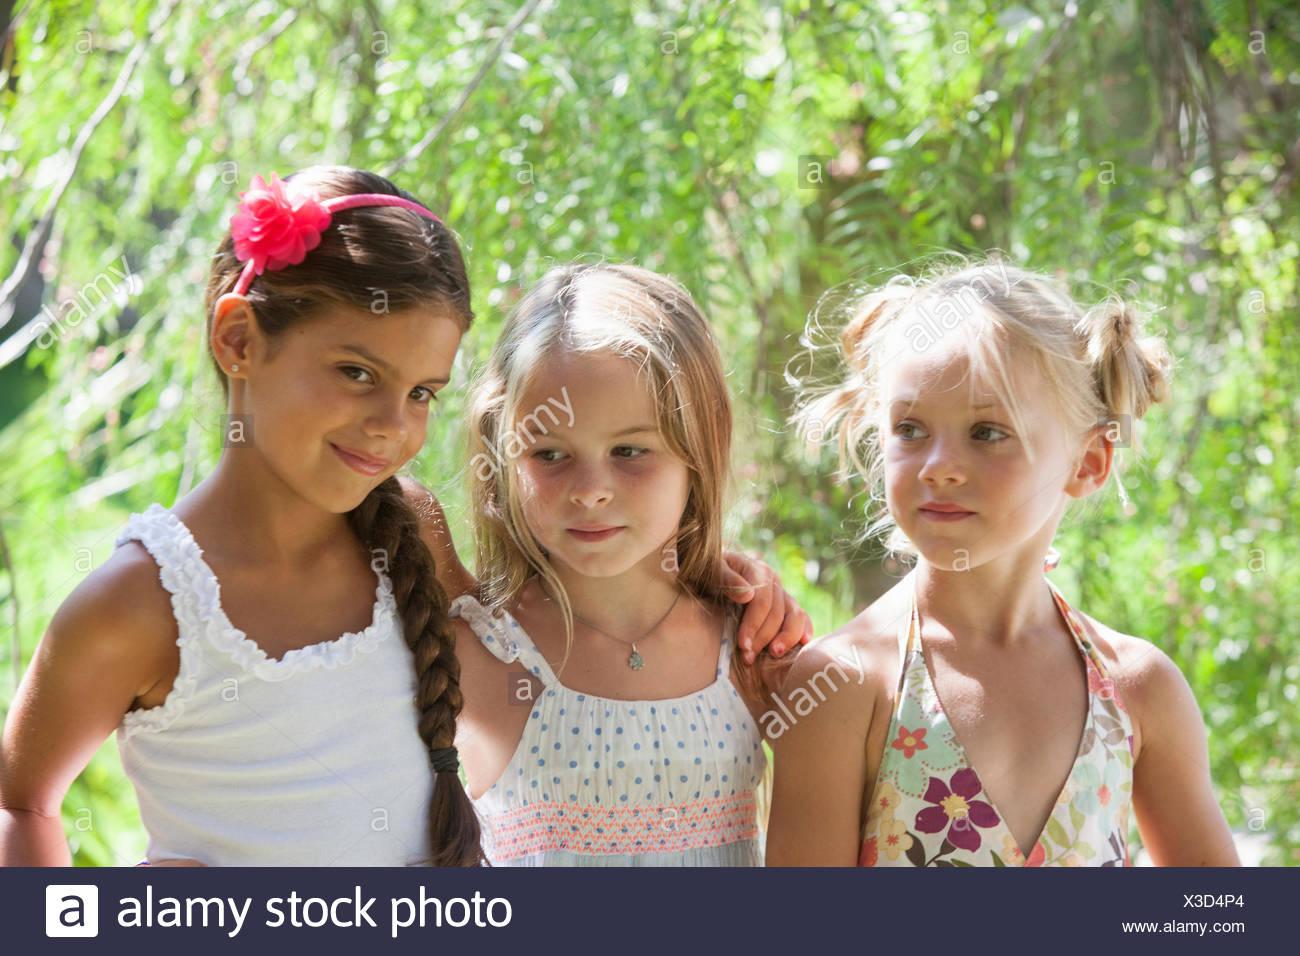 candid portrait of three girls in garden stock photo: 277498988 - alamy